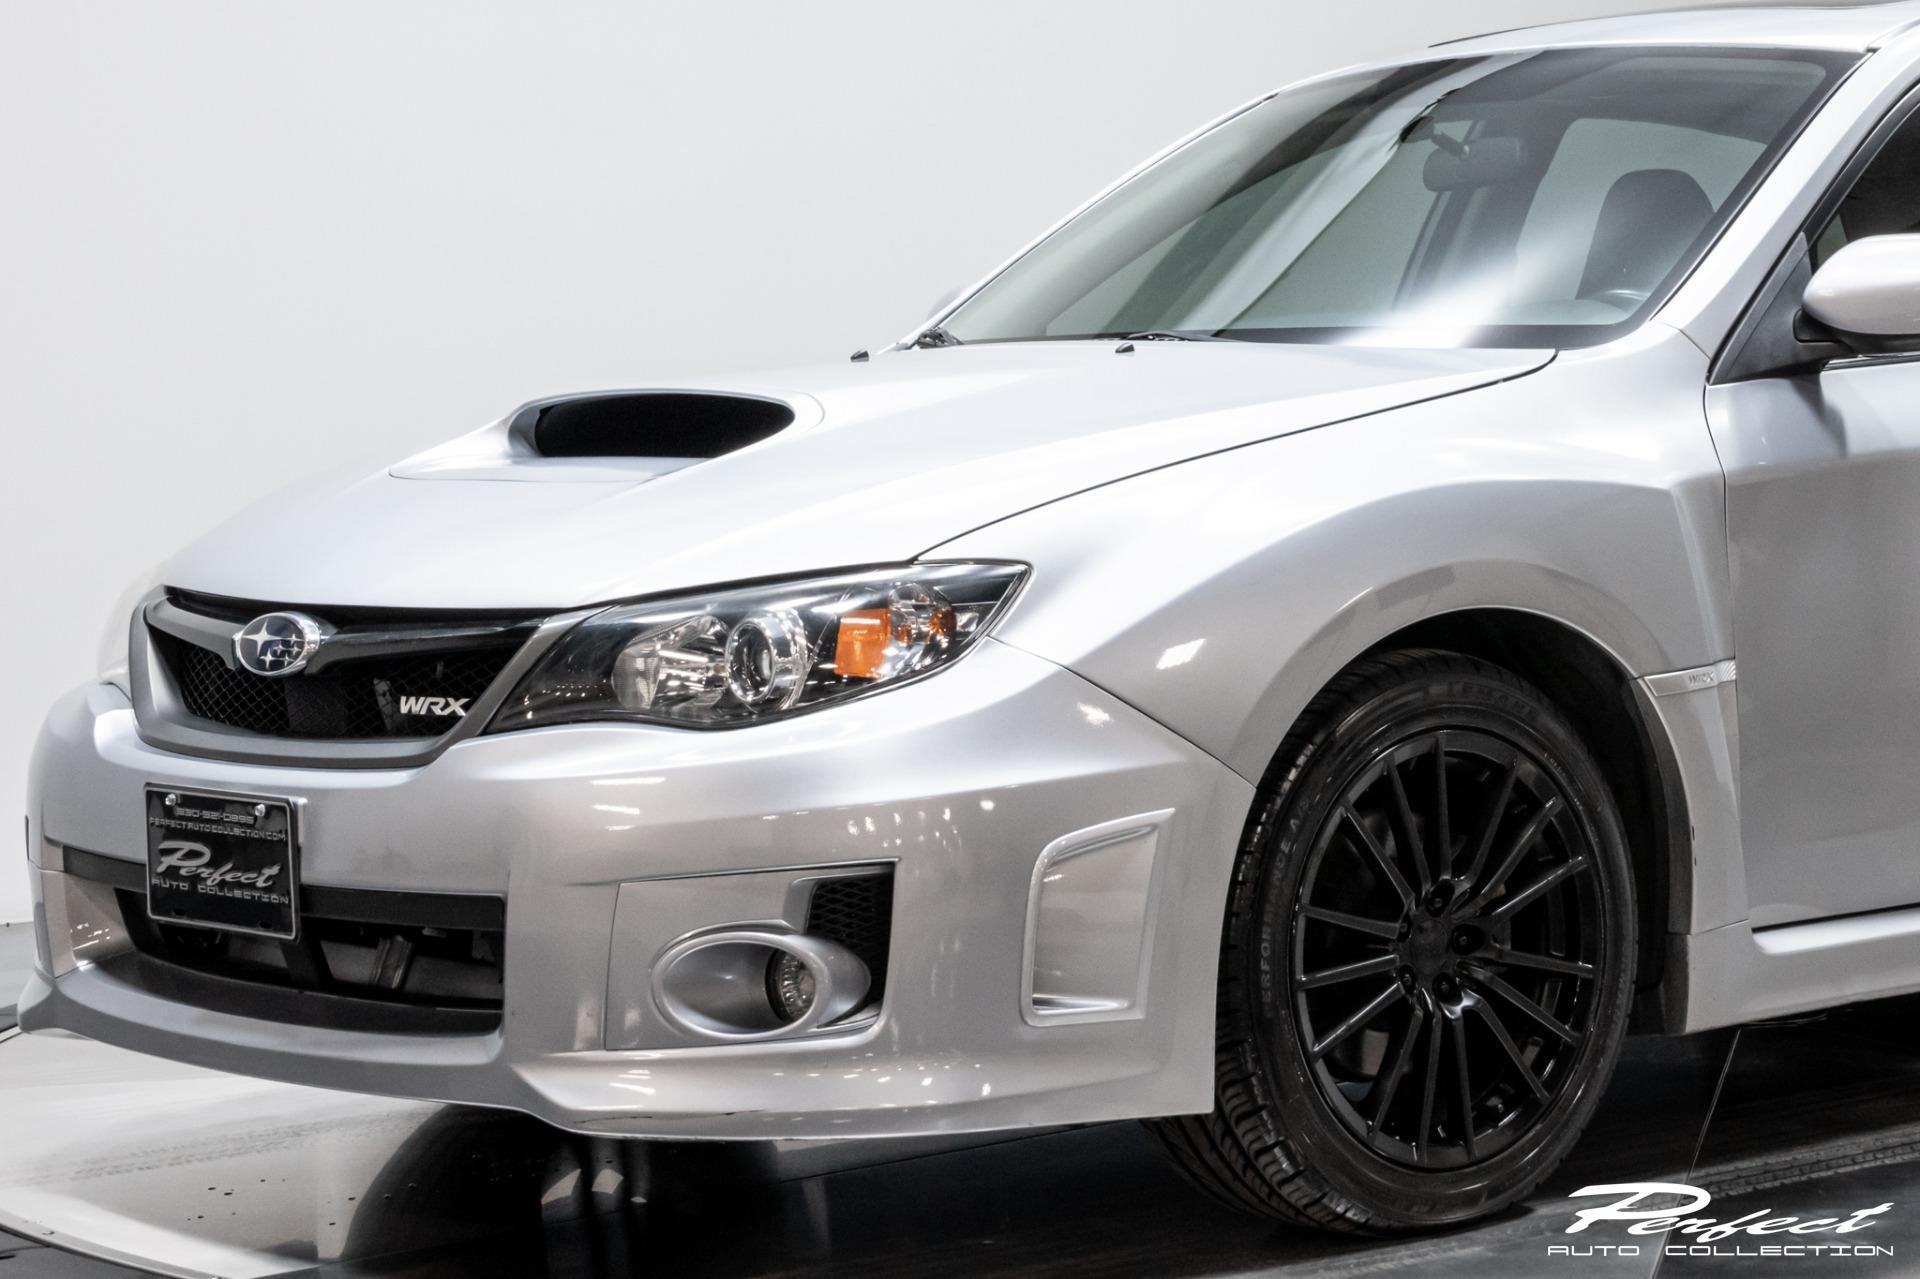 Used 2014 Subaru Impreza WRX Limited